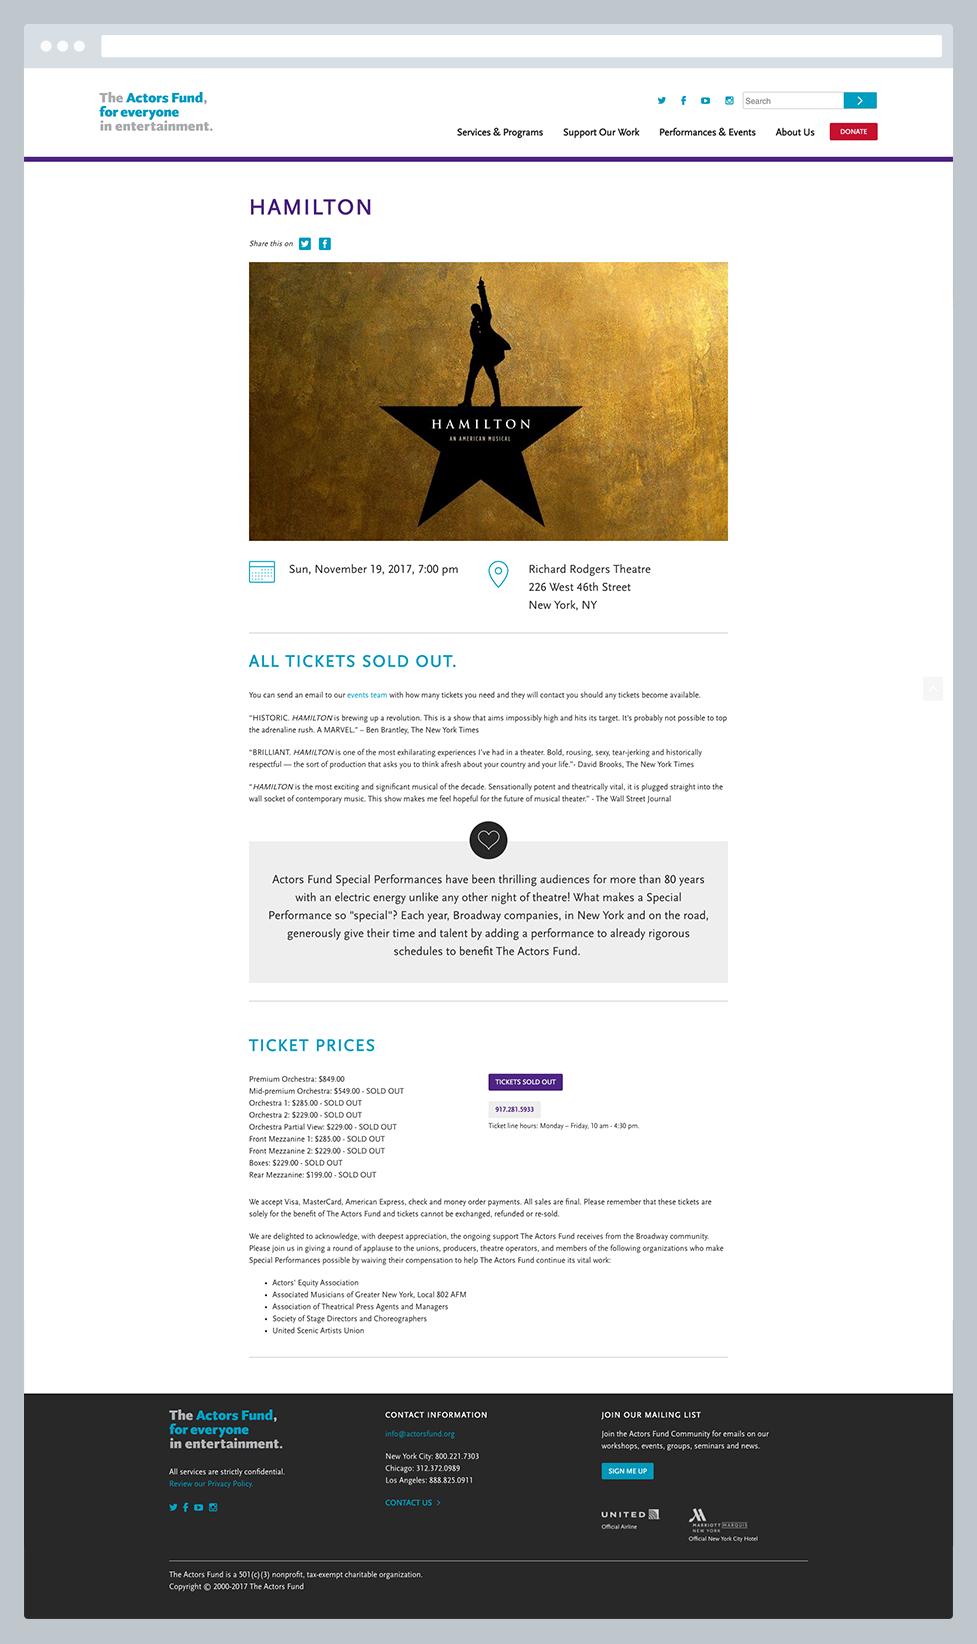 JR_PP_ActorsFund_PerformancesDetailPage_WebsiteMockup.png